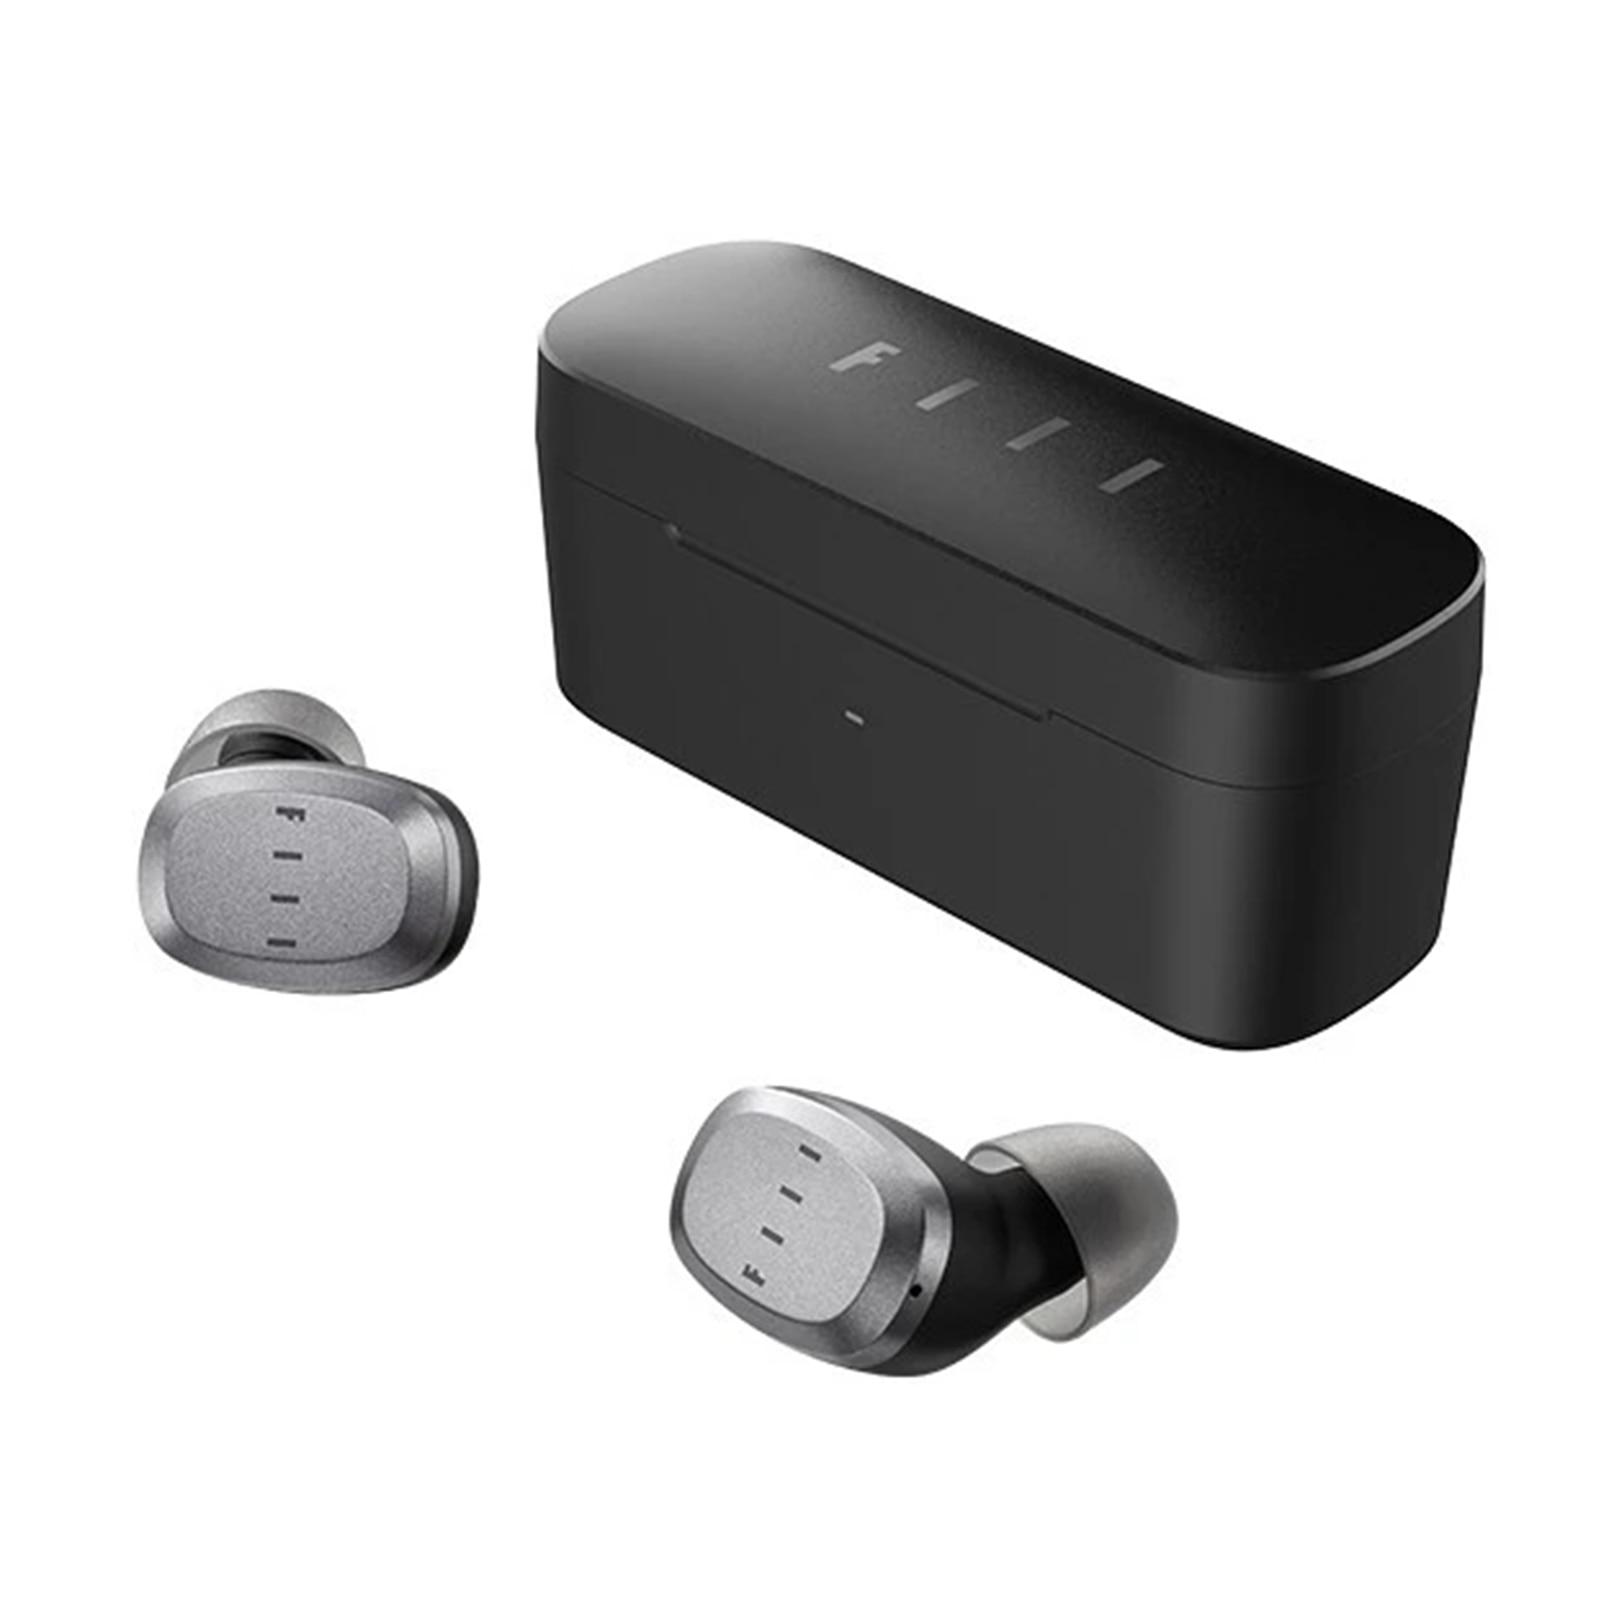 fiil t1x tws true wireless earbuds in ear bluetooth earbuds For FIIL T1 Lite Bluetooth Headphones Wireless Earbuds TWS Noise-canceling Earphones Headset Accessories Drop Shipping